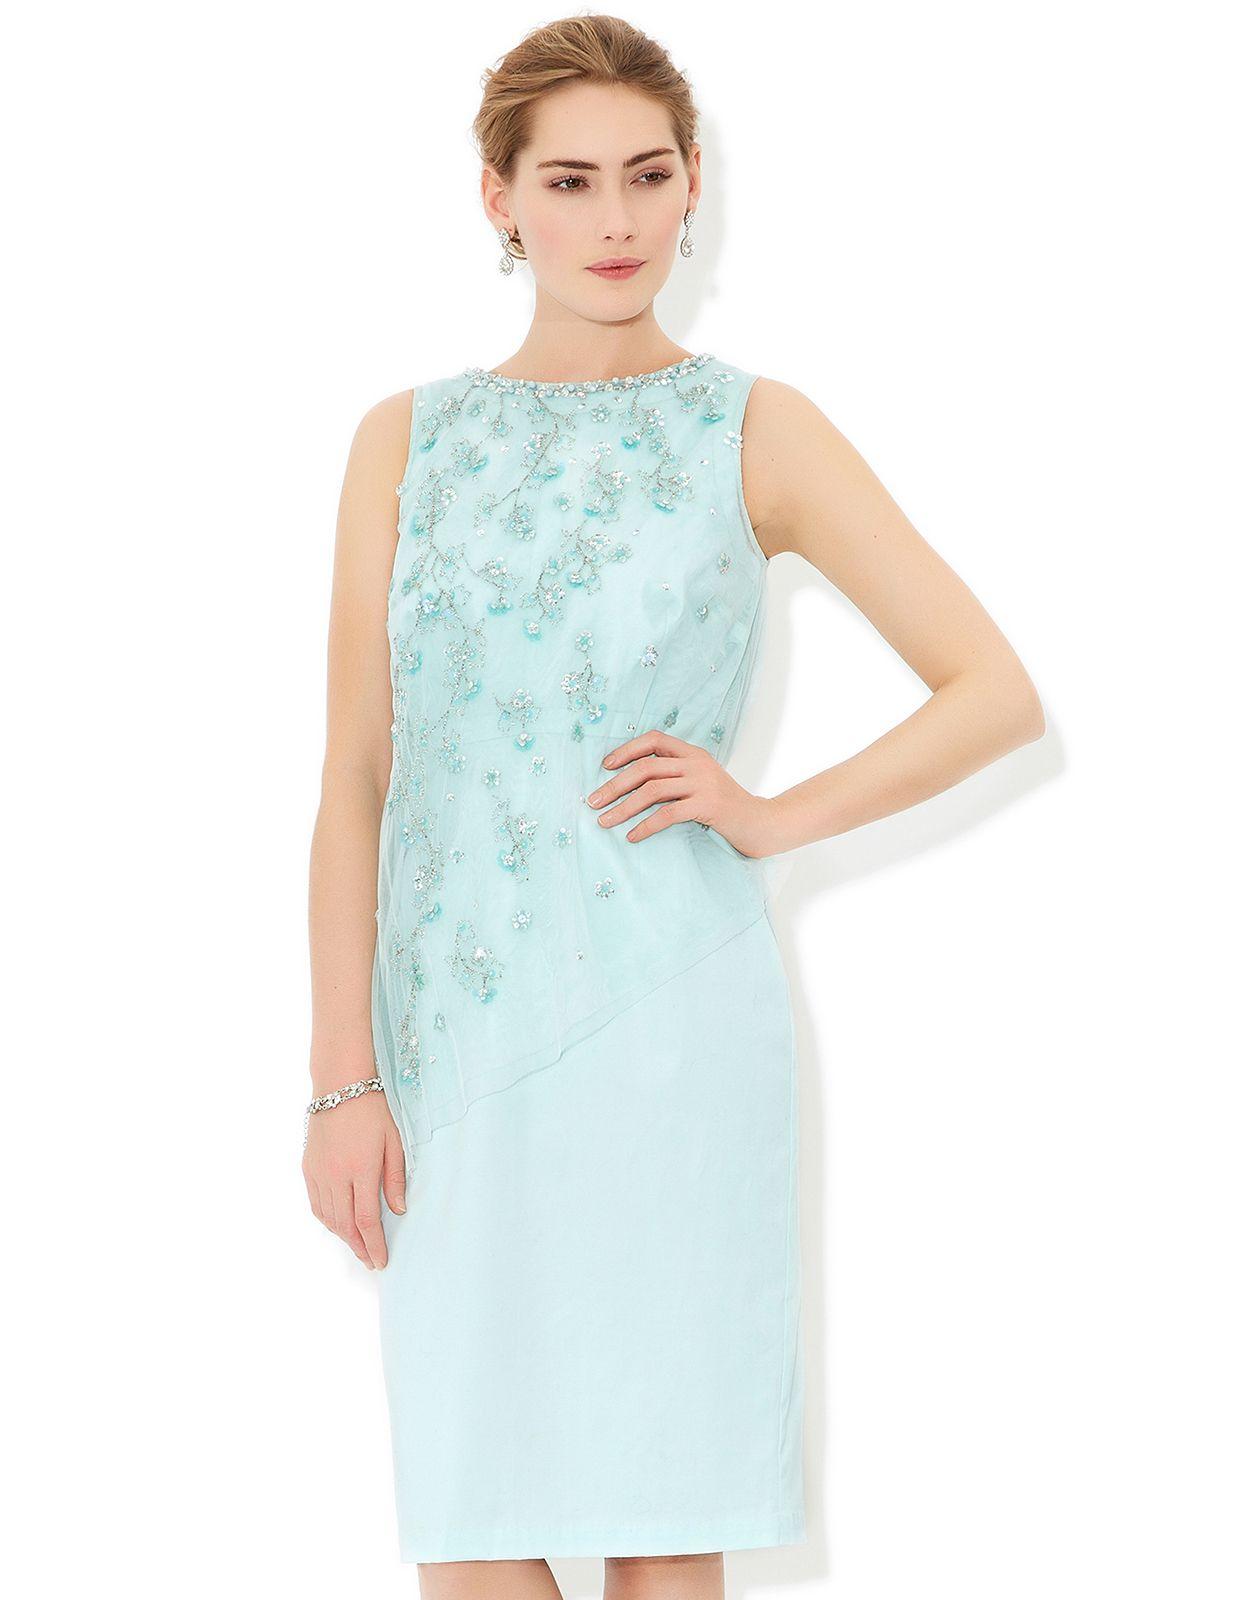 Faith dress blue monsoon bridesmaid dresses pinterest faith dress blue monsoon ombrellifo Choice Image